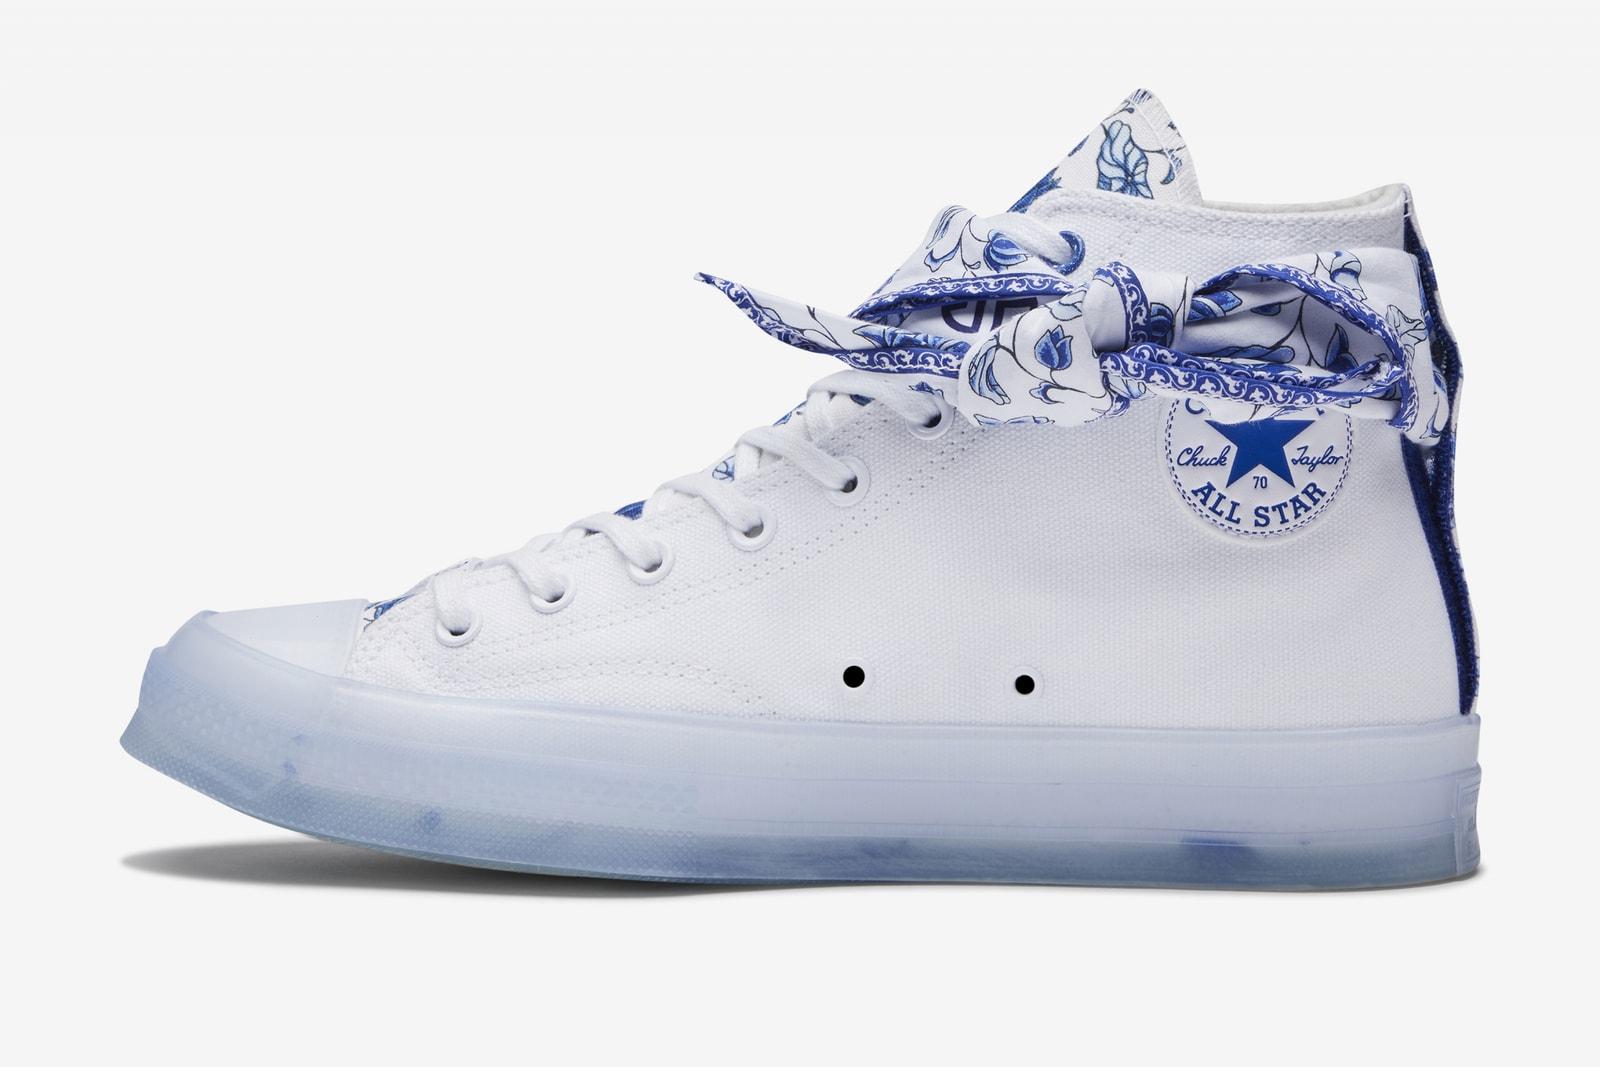 Converse 携手张艺兴推出全新联名鞋款